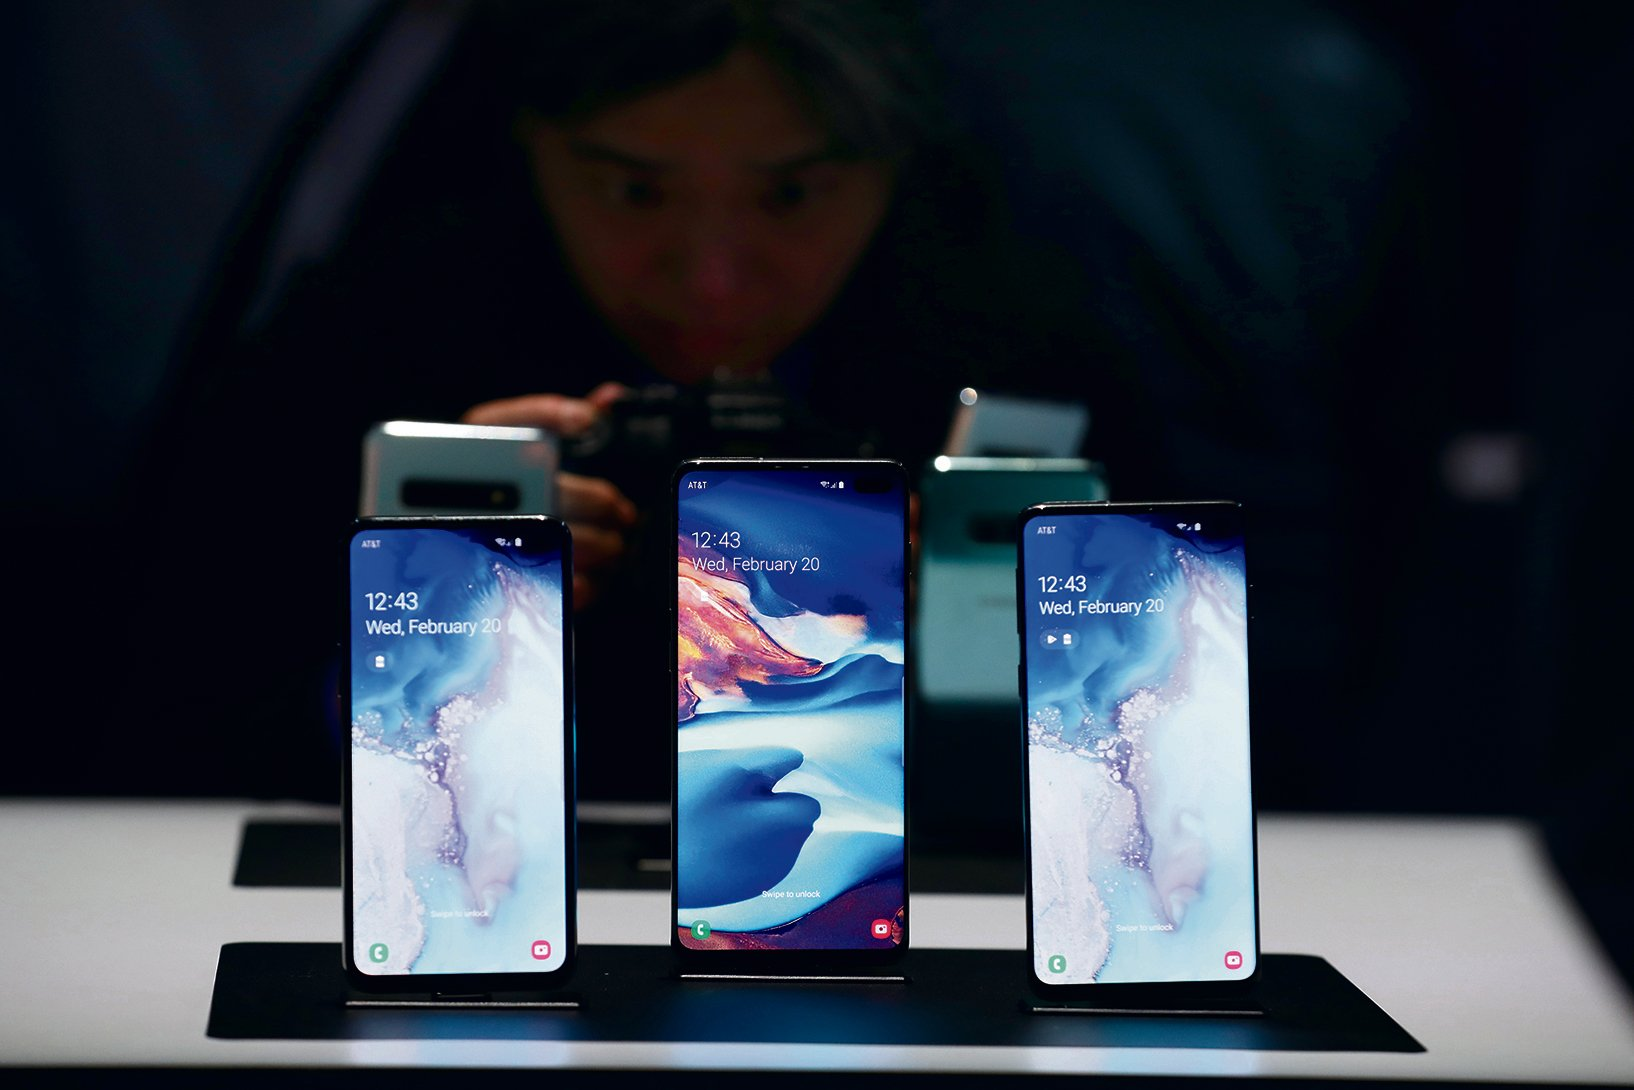 三星發佈了新一代旗艦手機S10系列,左起:Galaxy S10e、S10+和S10。(Justin Sullivan/Getty Images)